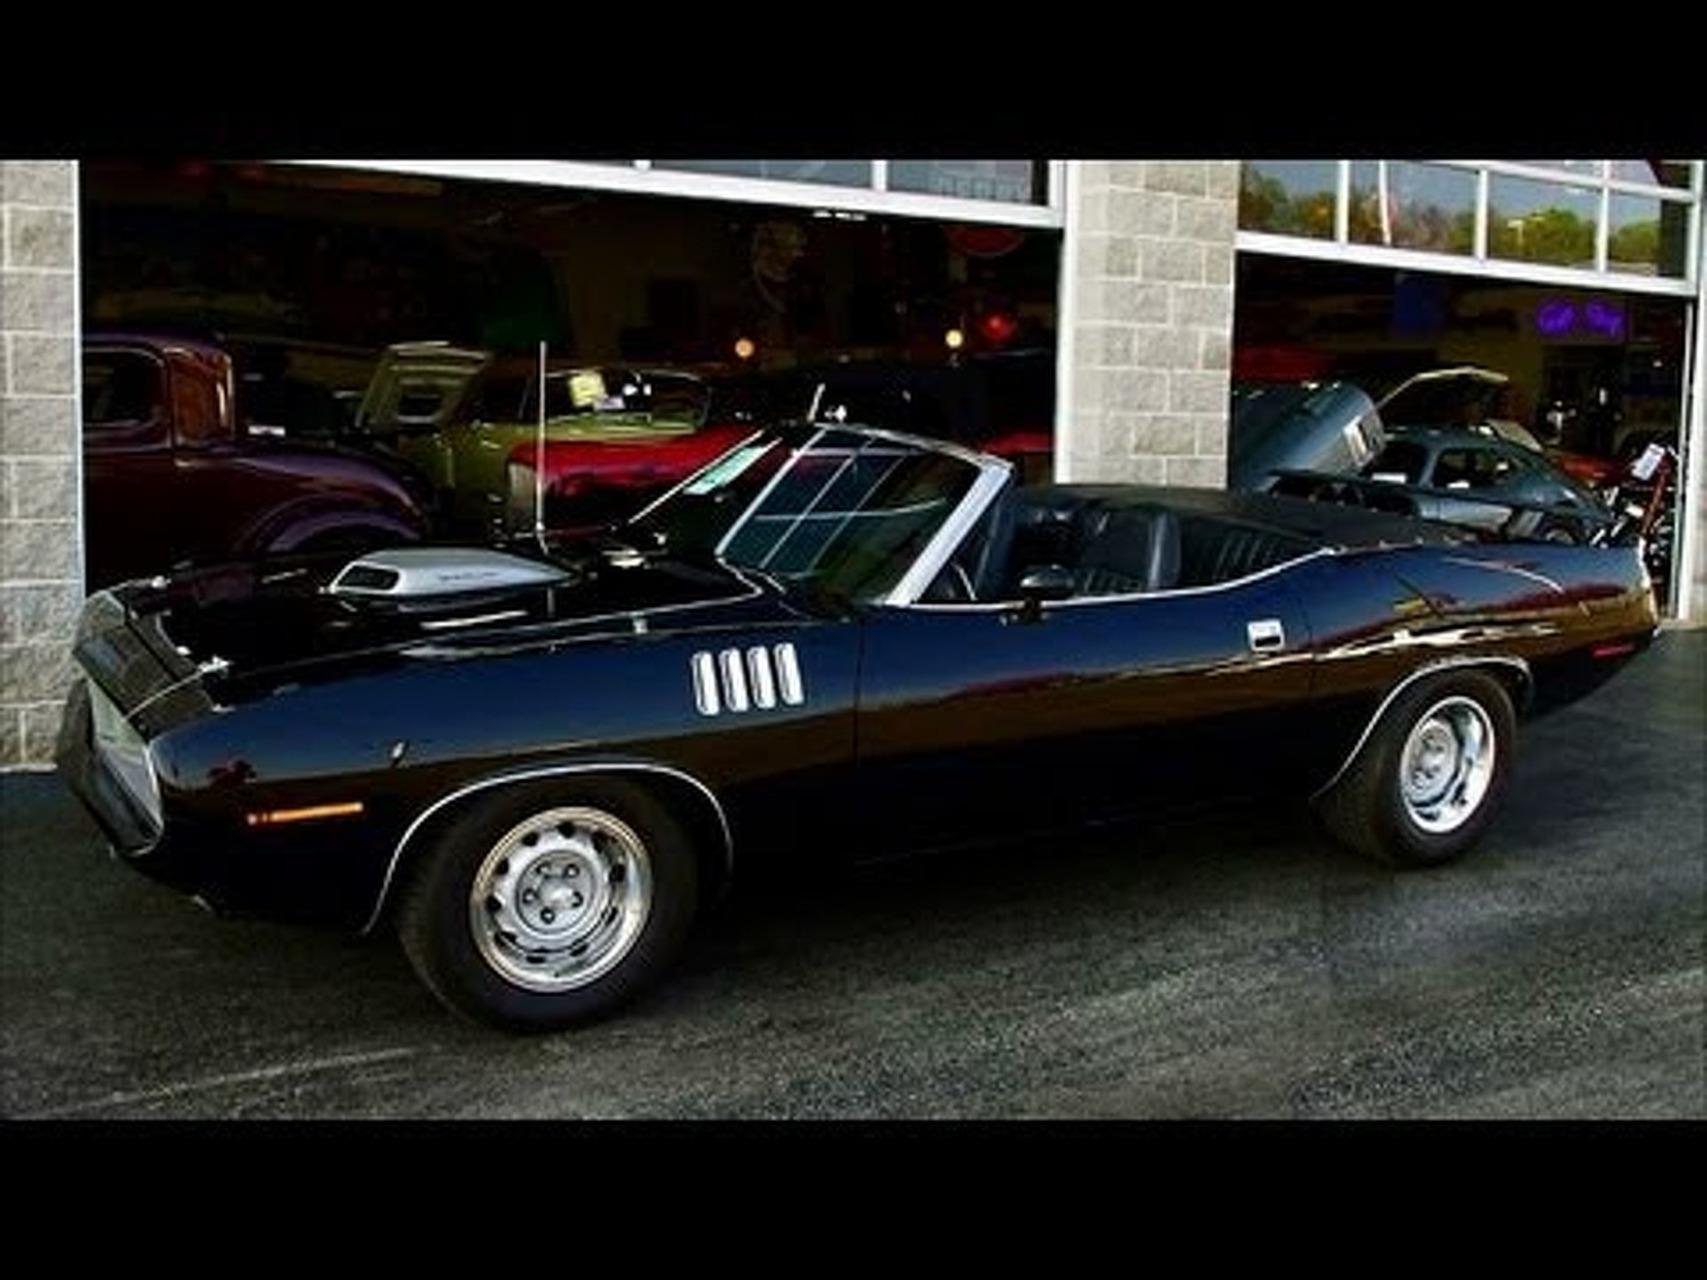 1971 Plymouth Barracuda 440 V8 Triple Black Convertible